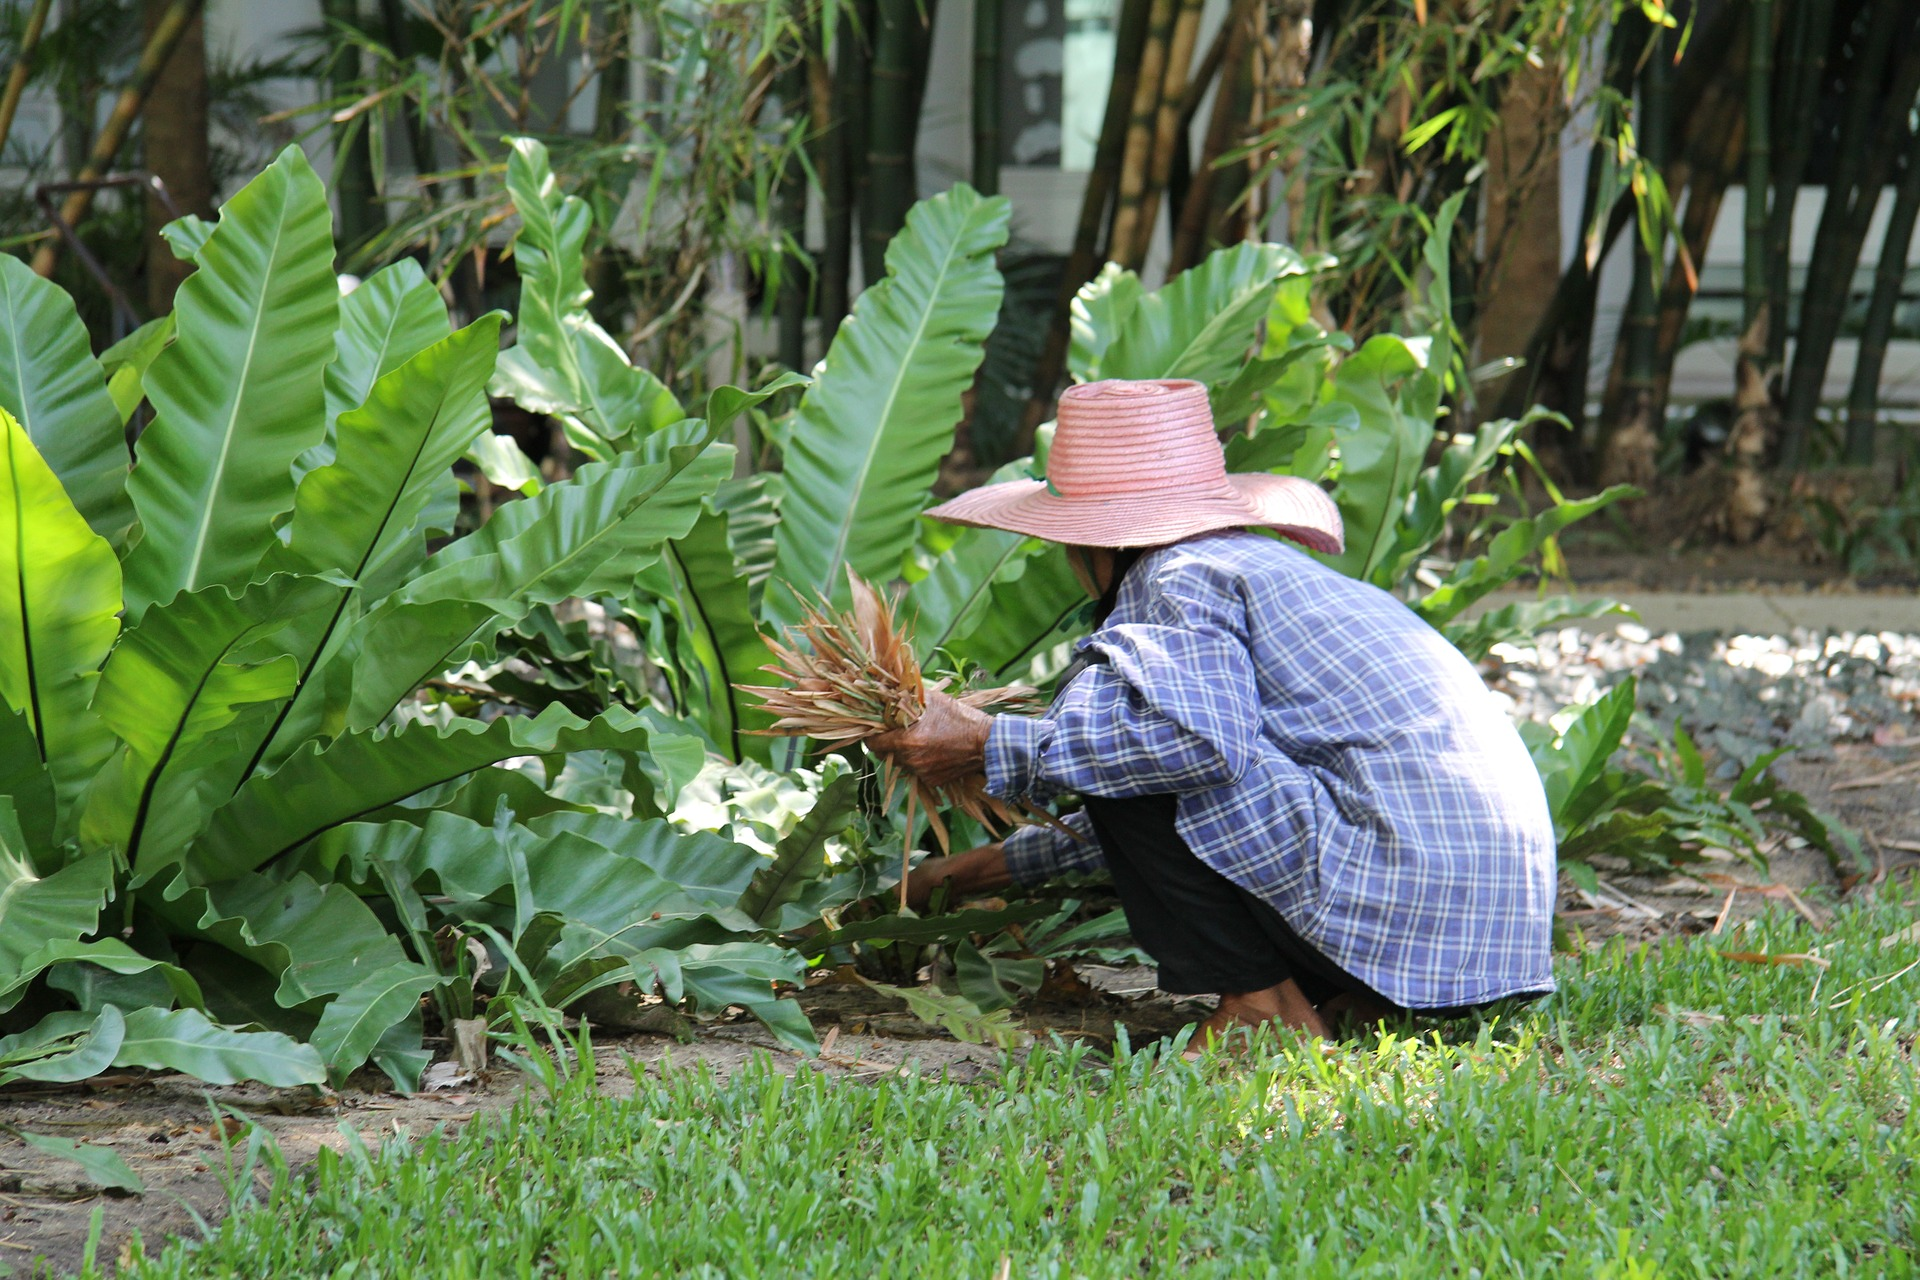 Hard working gardener